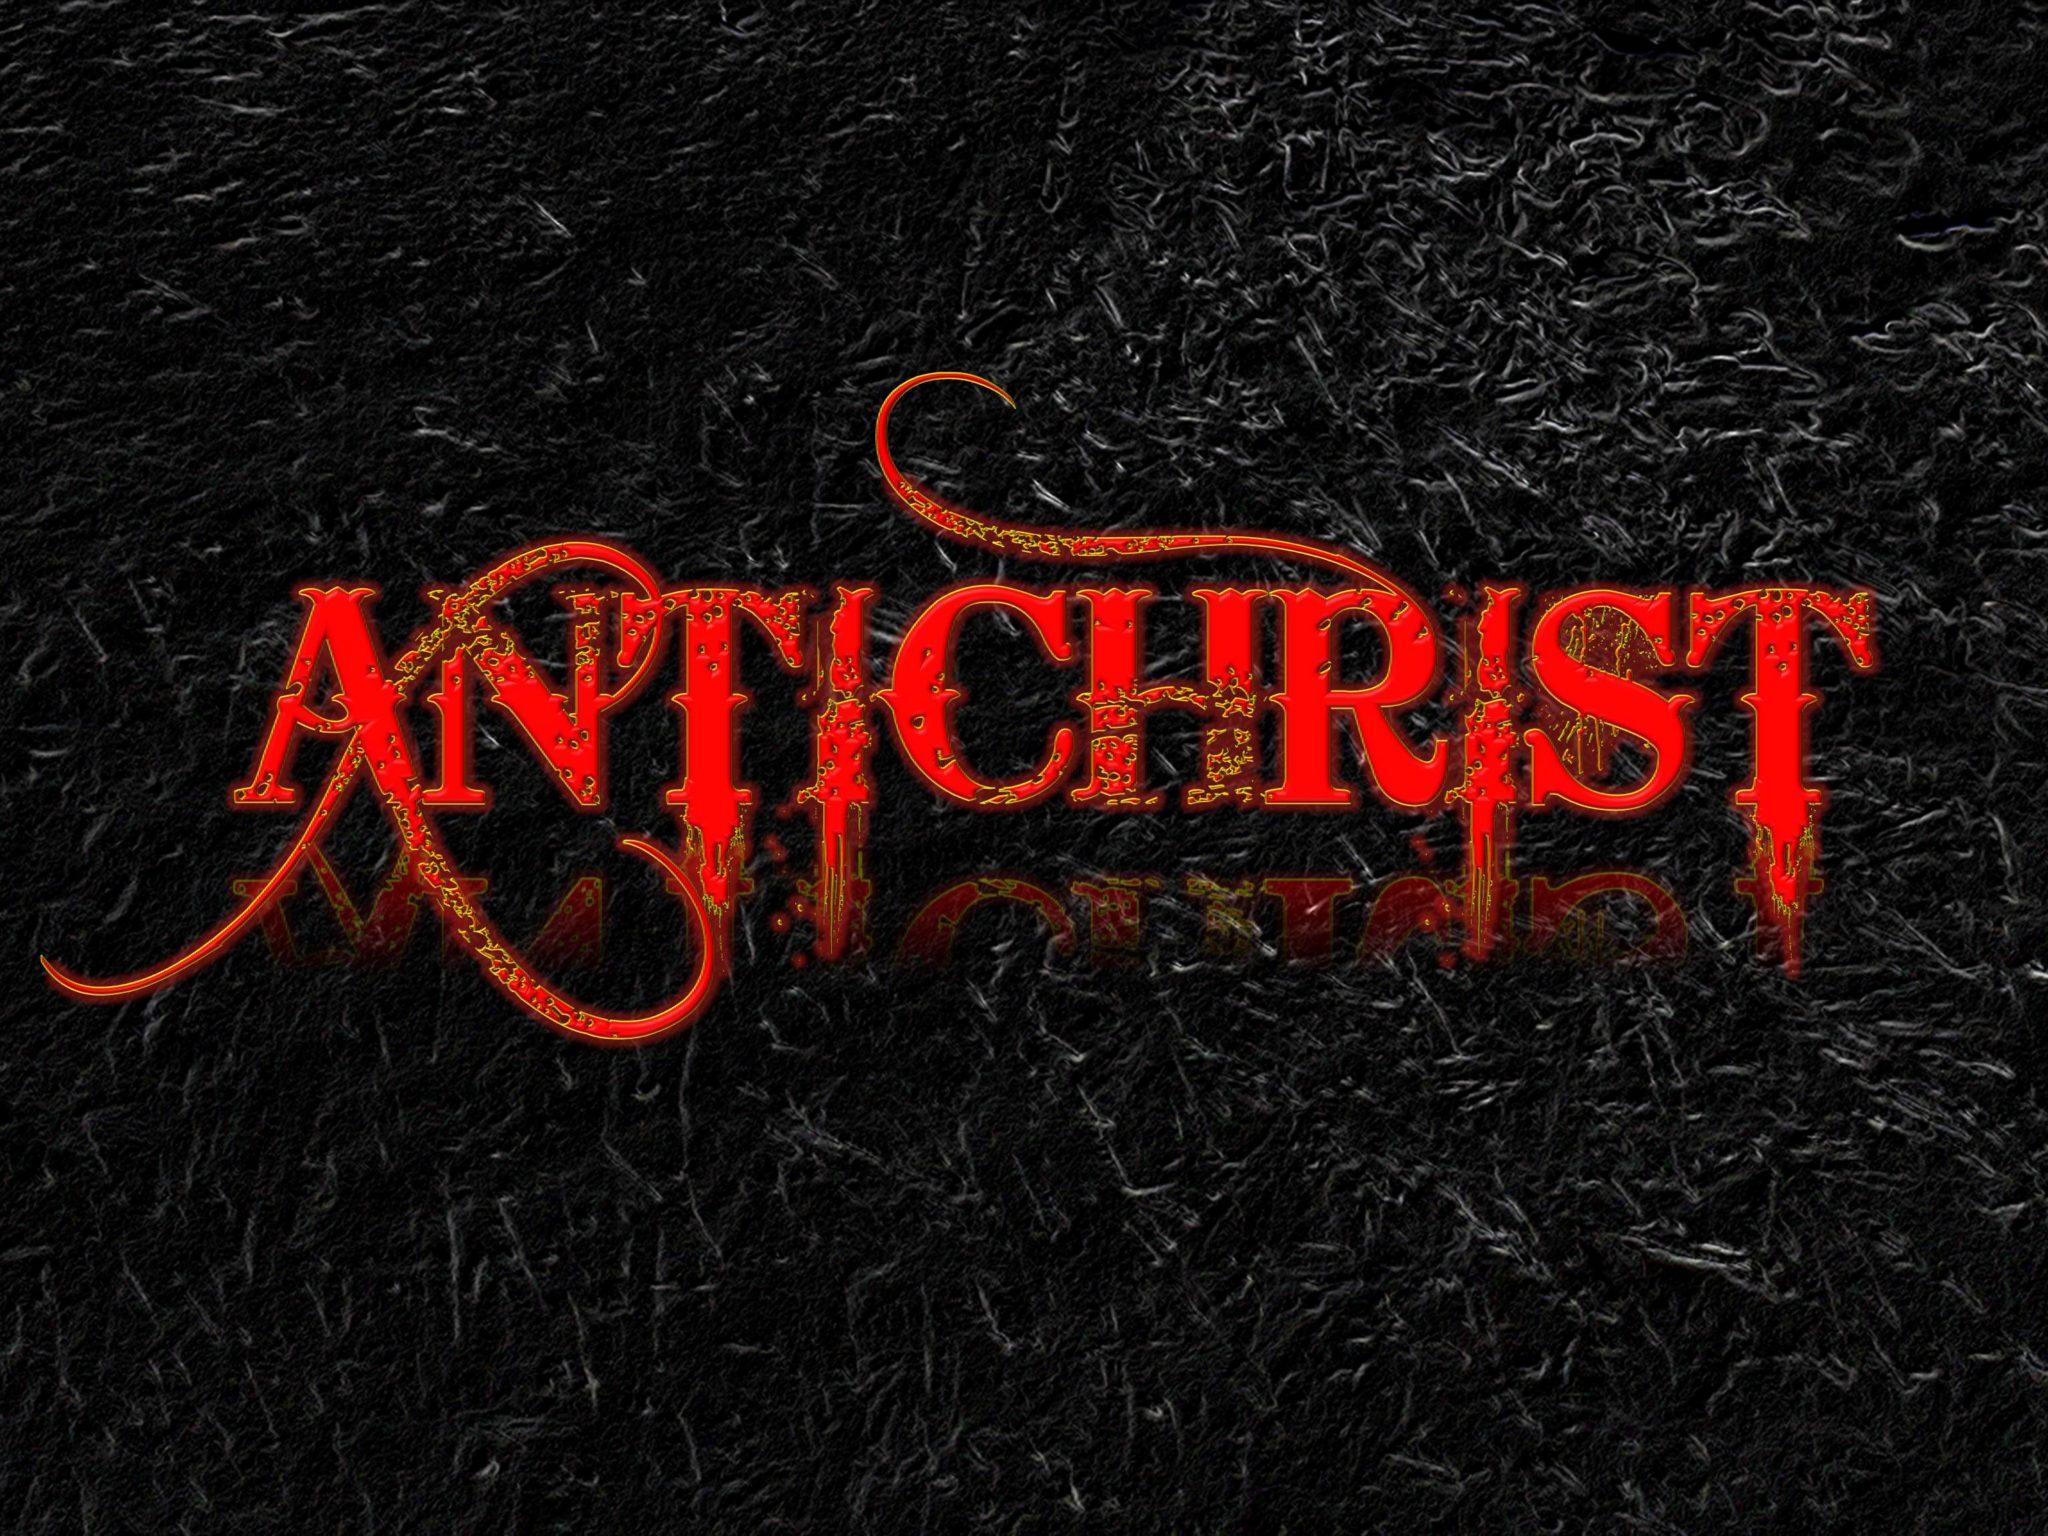 Revelation of the Antichrist